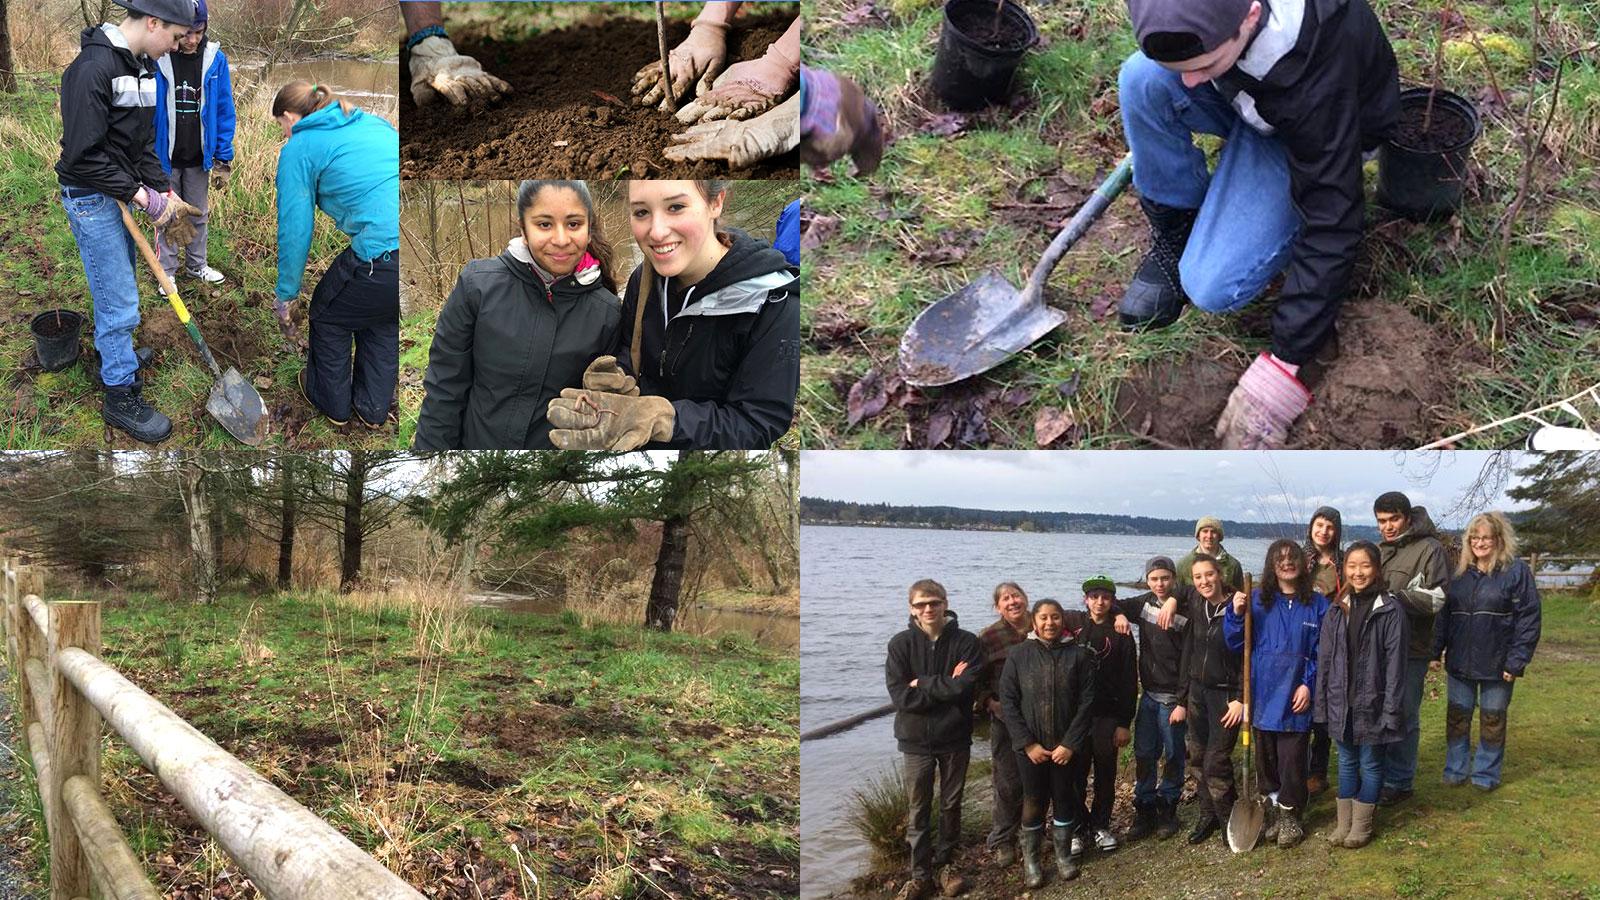 Students planting trees in Kirkland WA